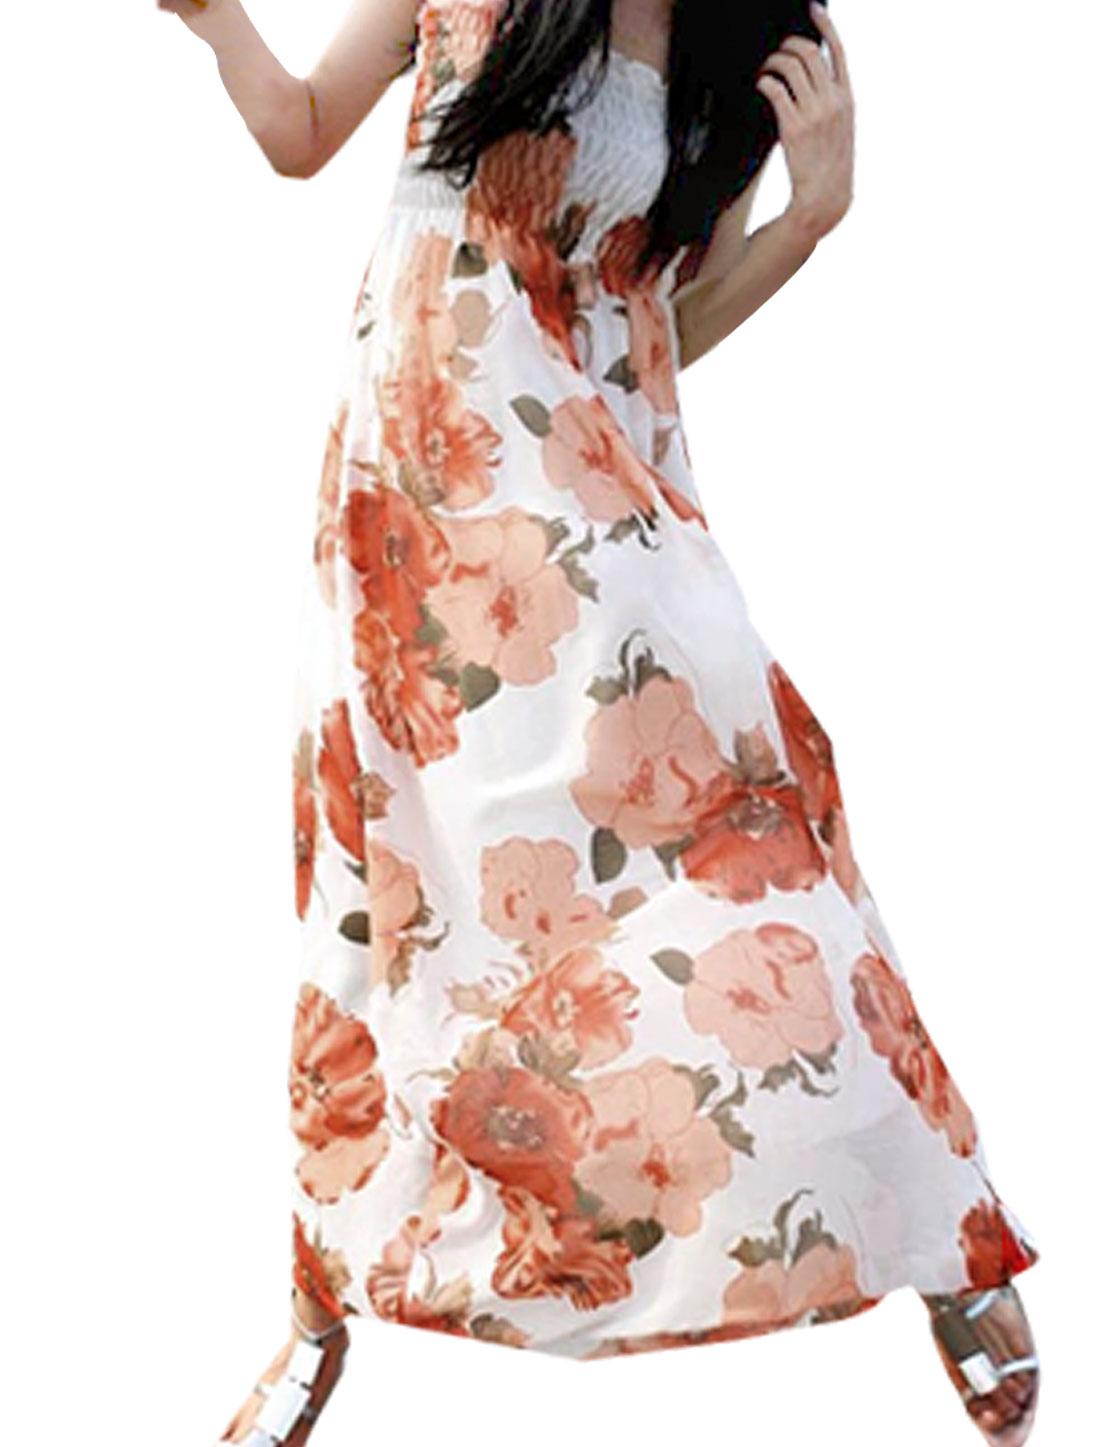 Ladies Adjustable Shoulder Strap Red Flowers White Chiffon Maxi Dress S